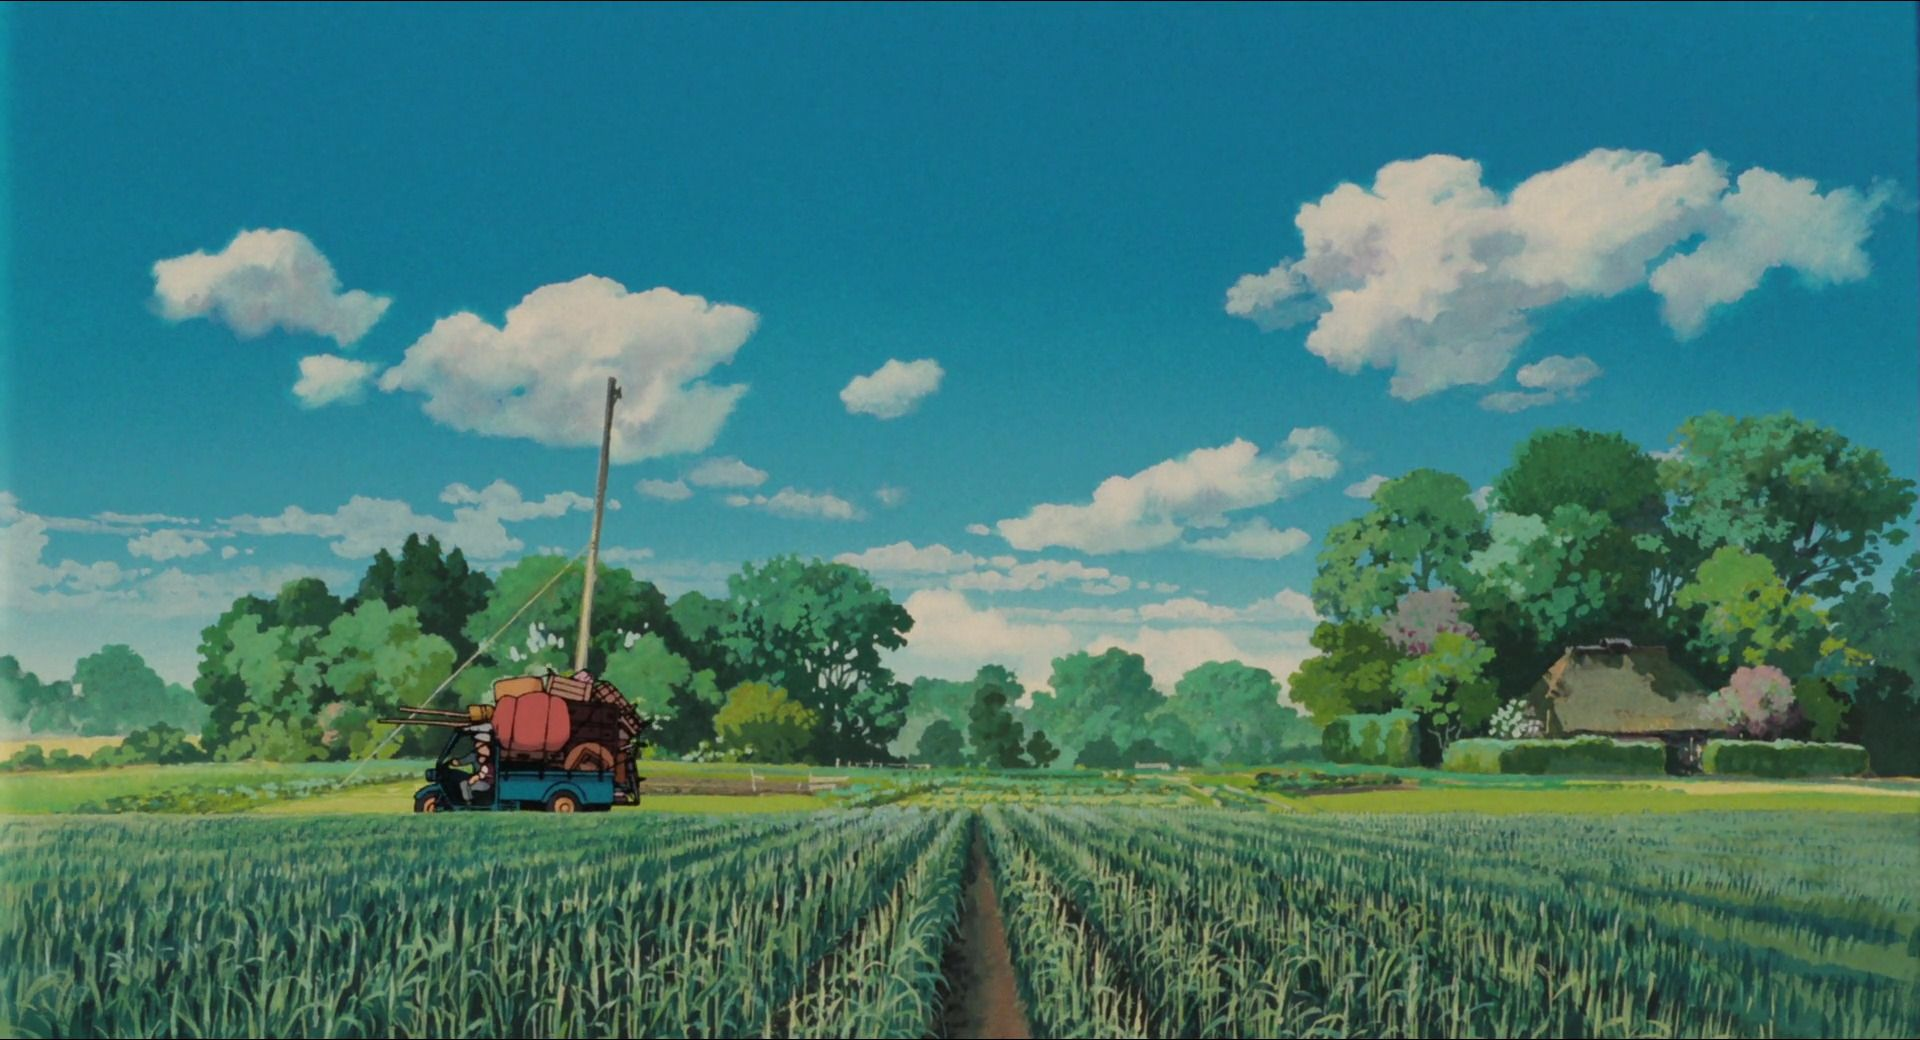 My Neighbor Totoro (1988) Disney Studio